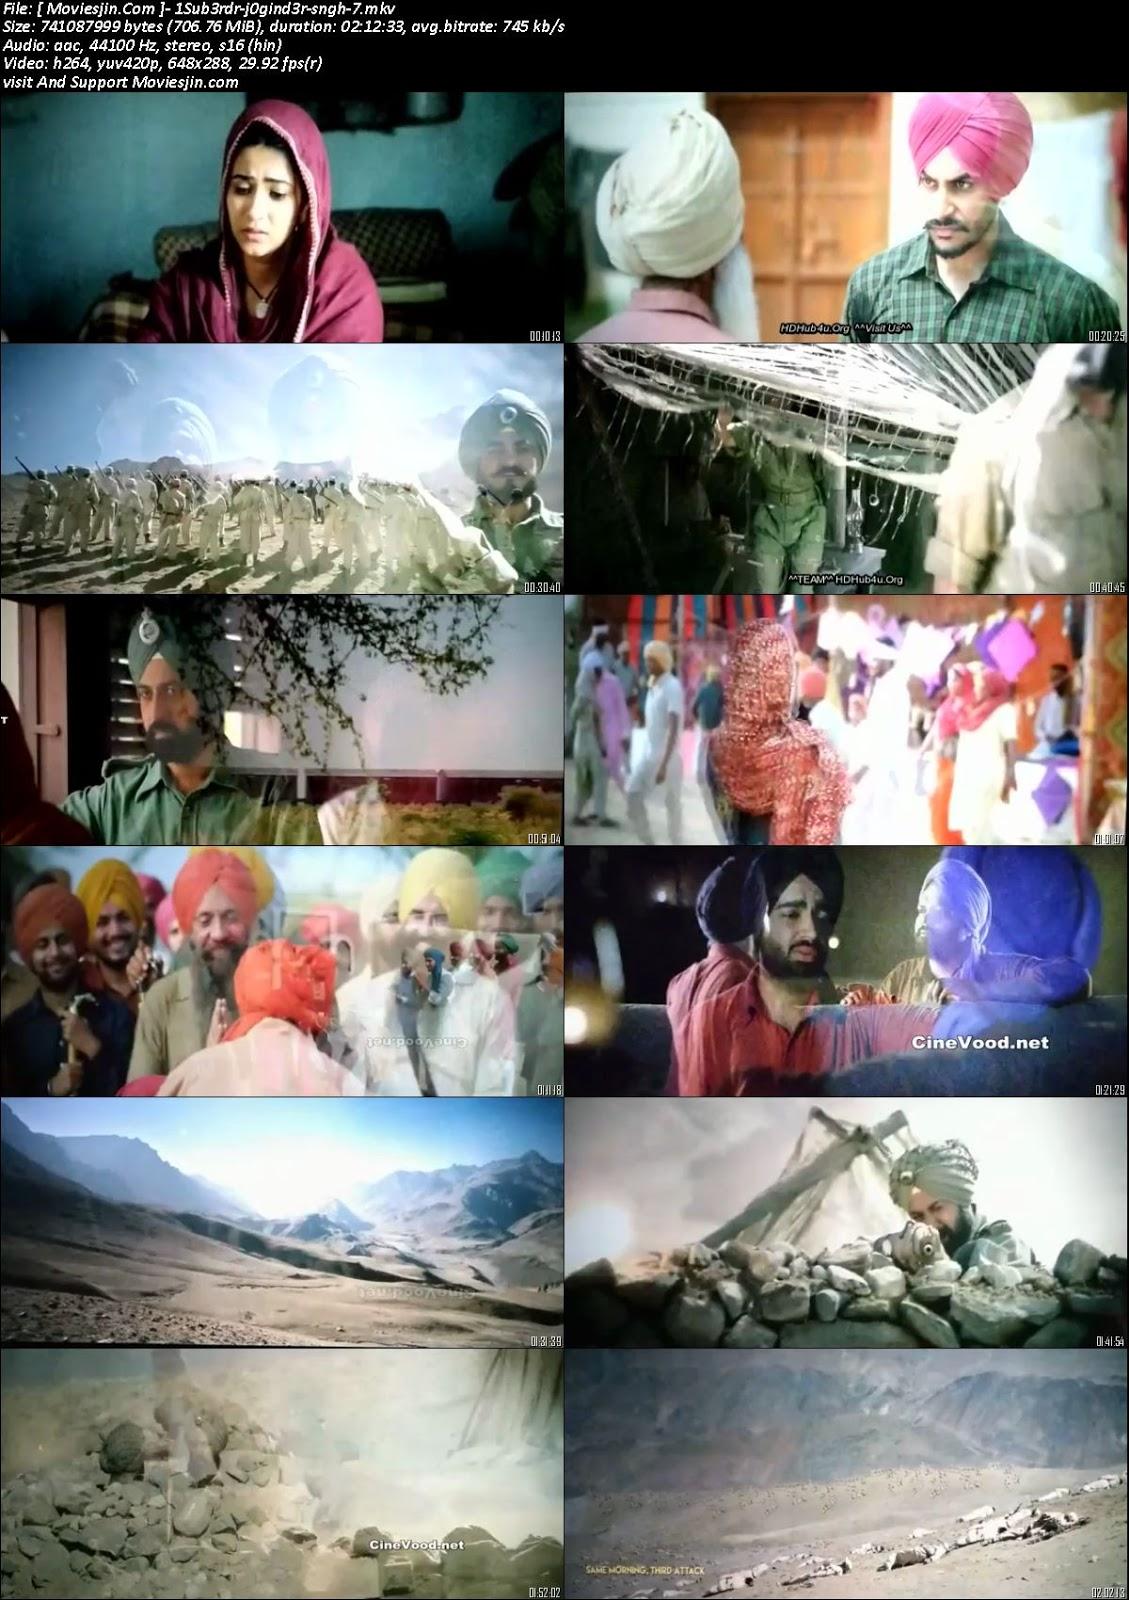 Watch Online Subedar Joginder Singh 2018 Punjabi DvD-Scr x264 700MB Full Movie Download Khatrimaza, free download 9xmovies,